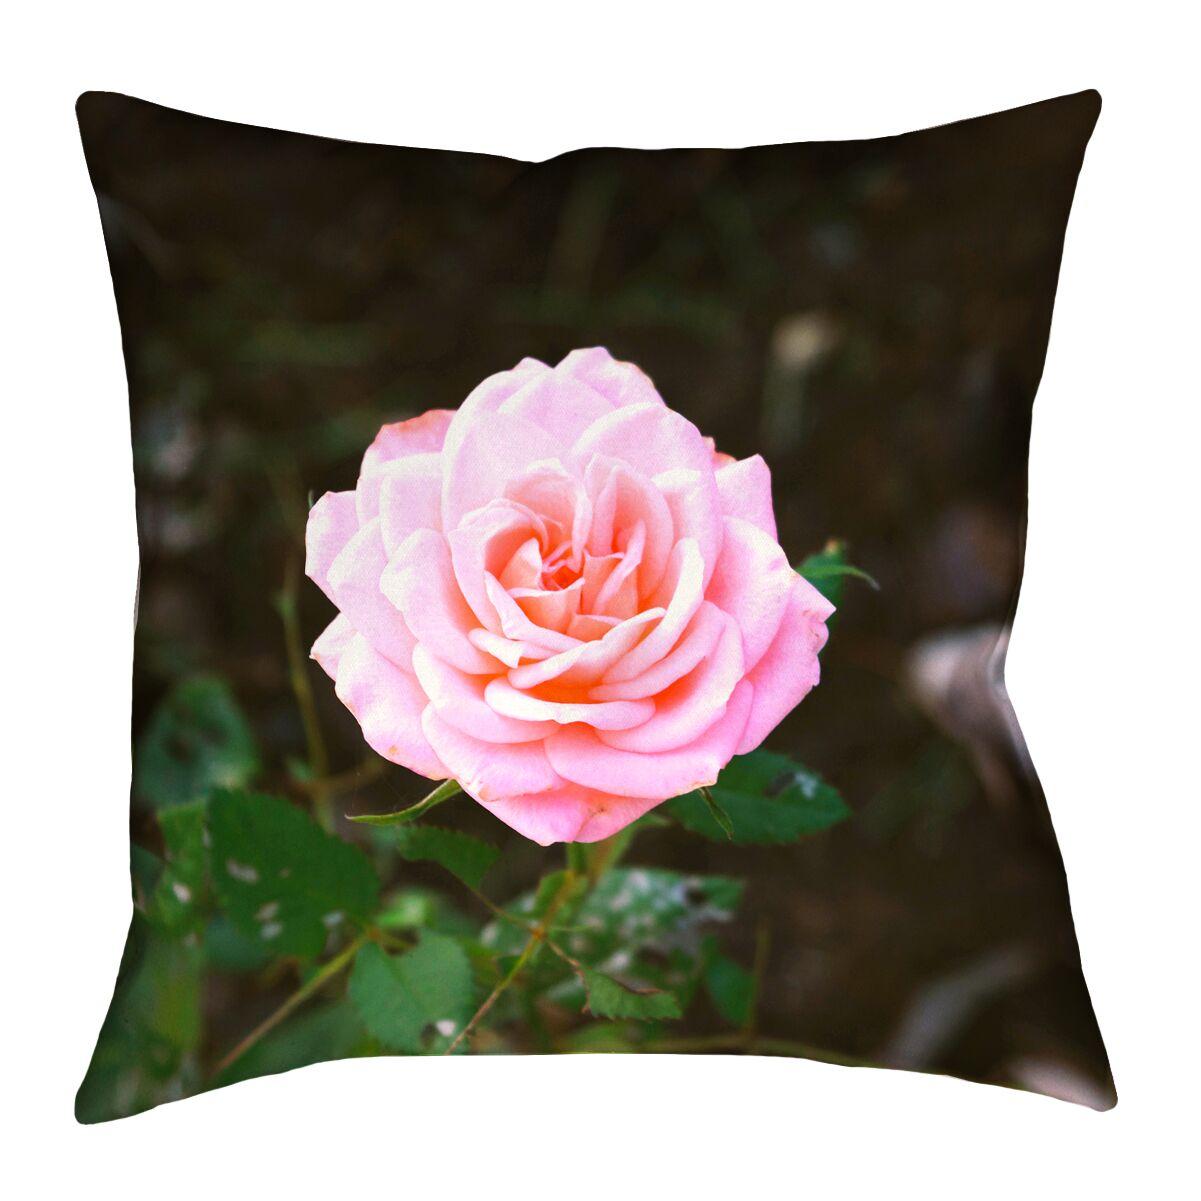 Rose Square Euro Pillow